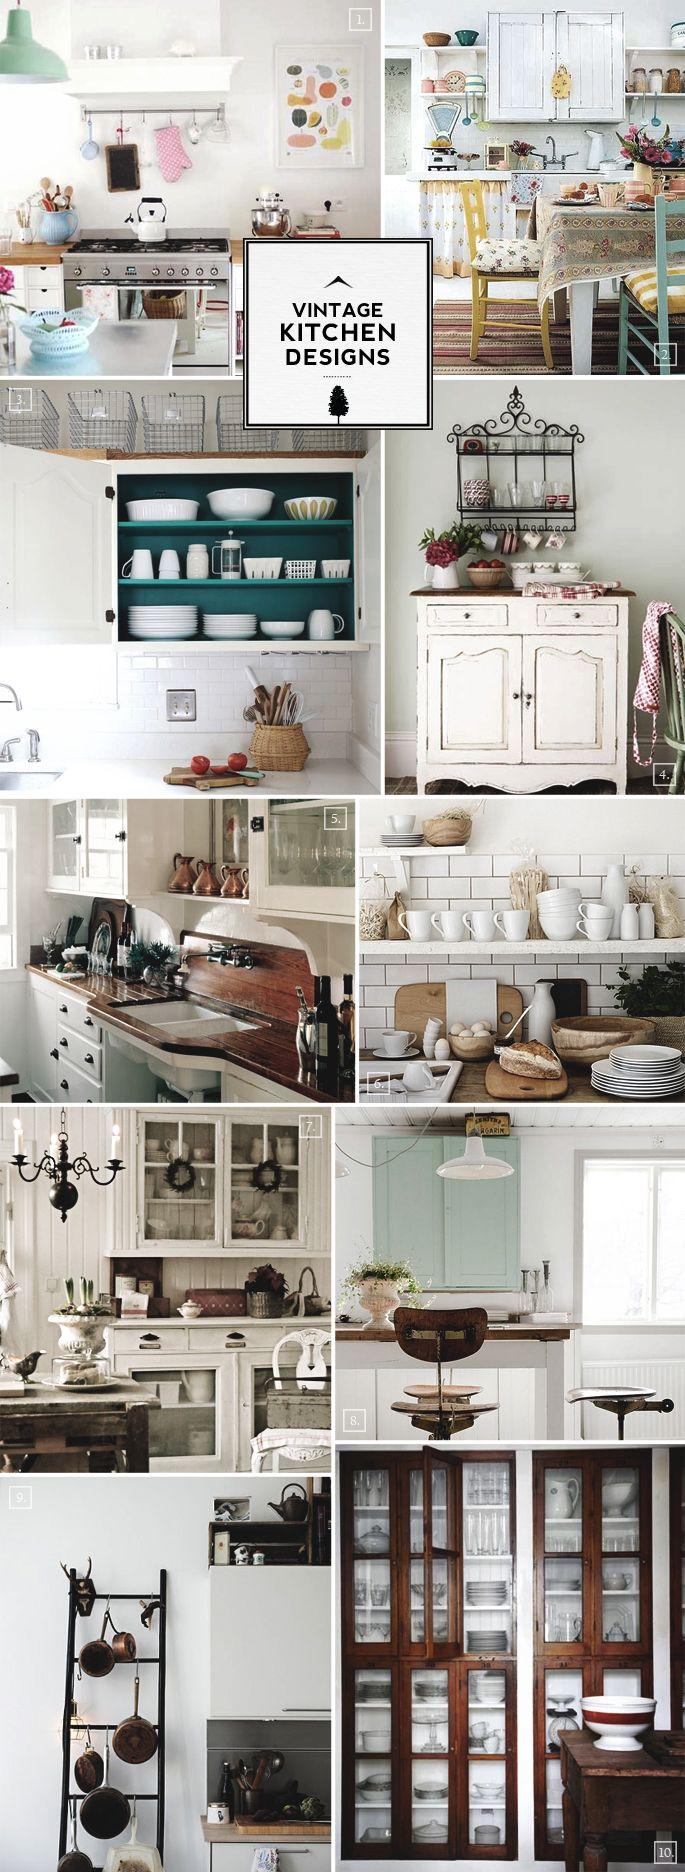 Old Fashioned Kitchen Design 6288 Best Images About My Vintage Farm Kitchen On Pinterest